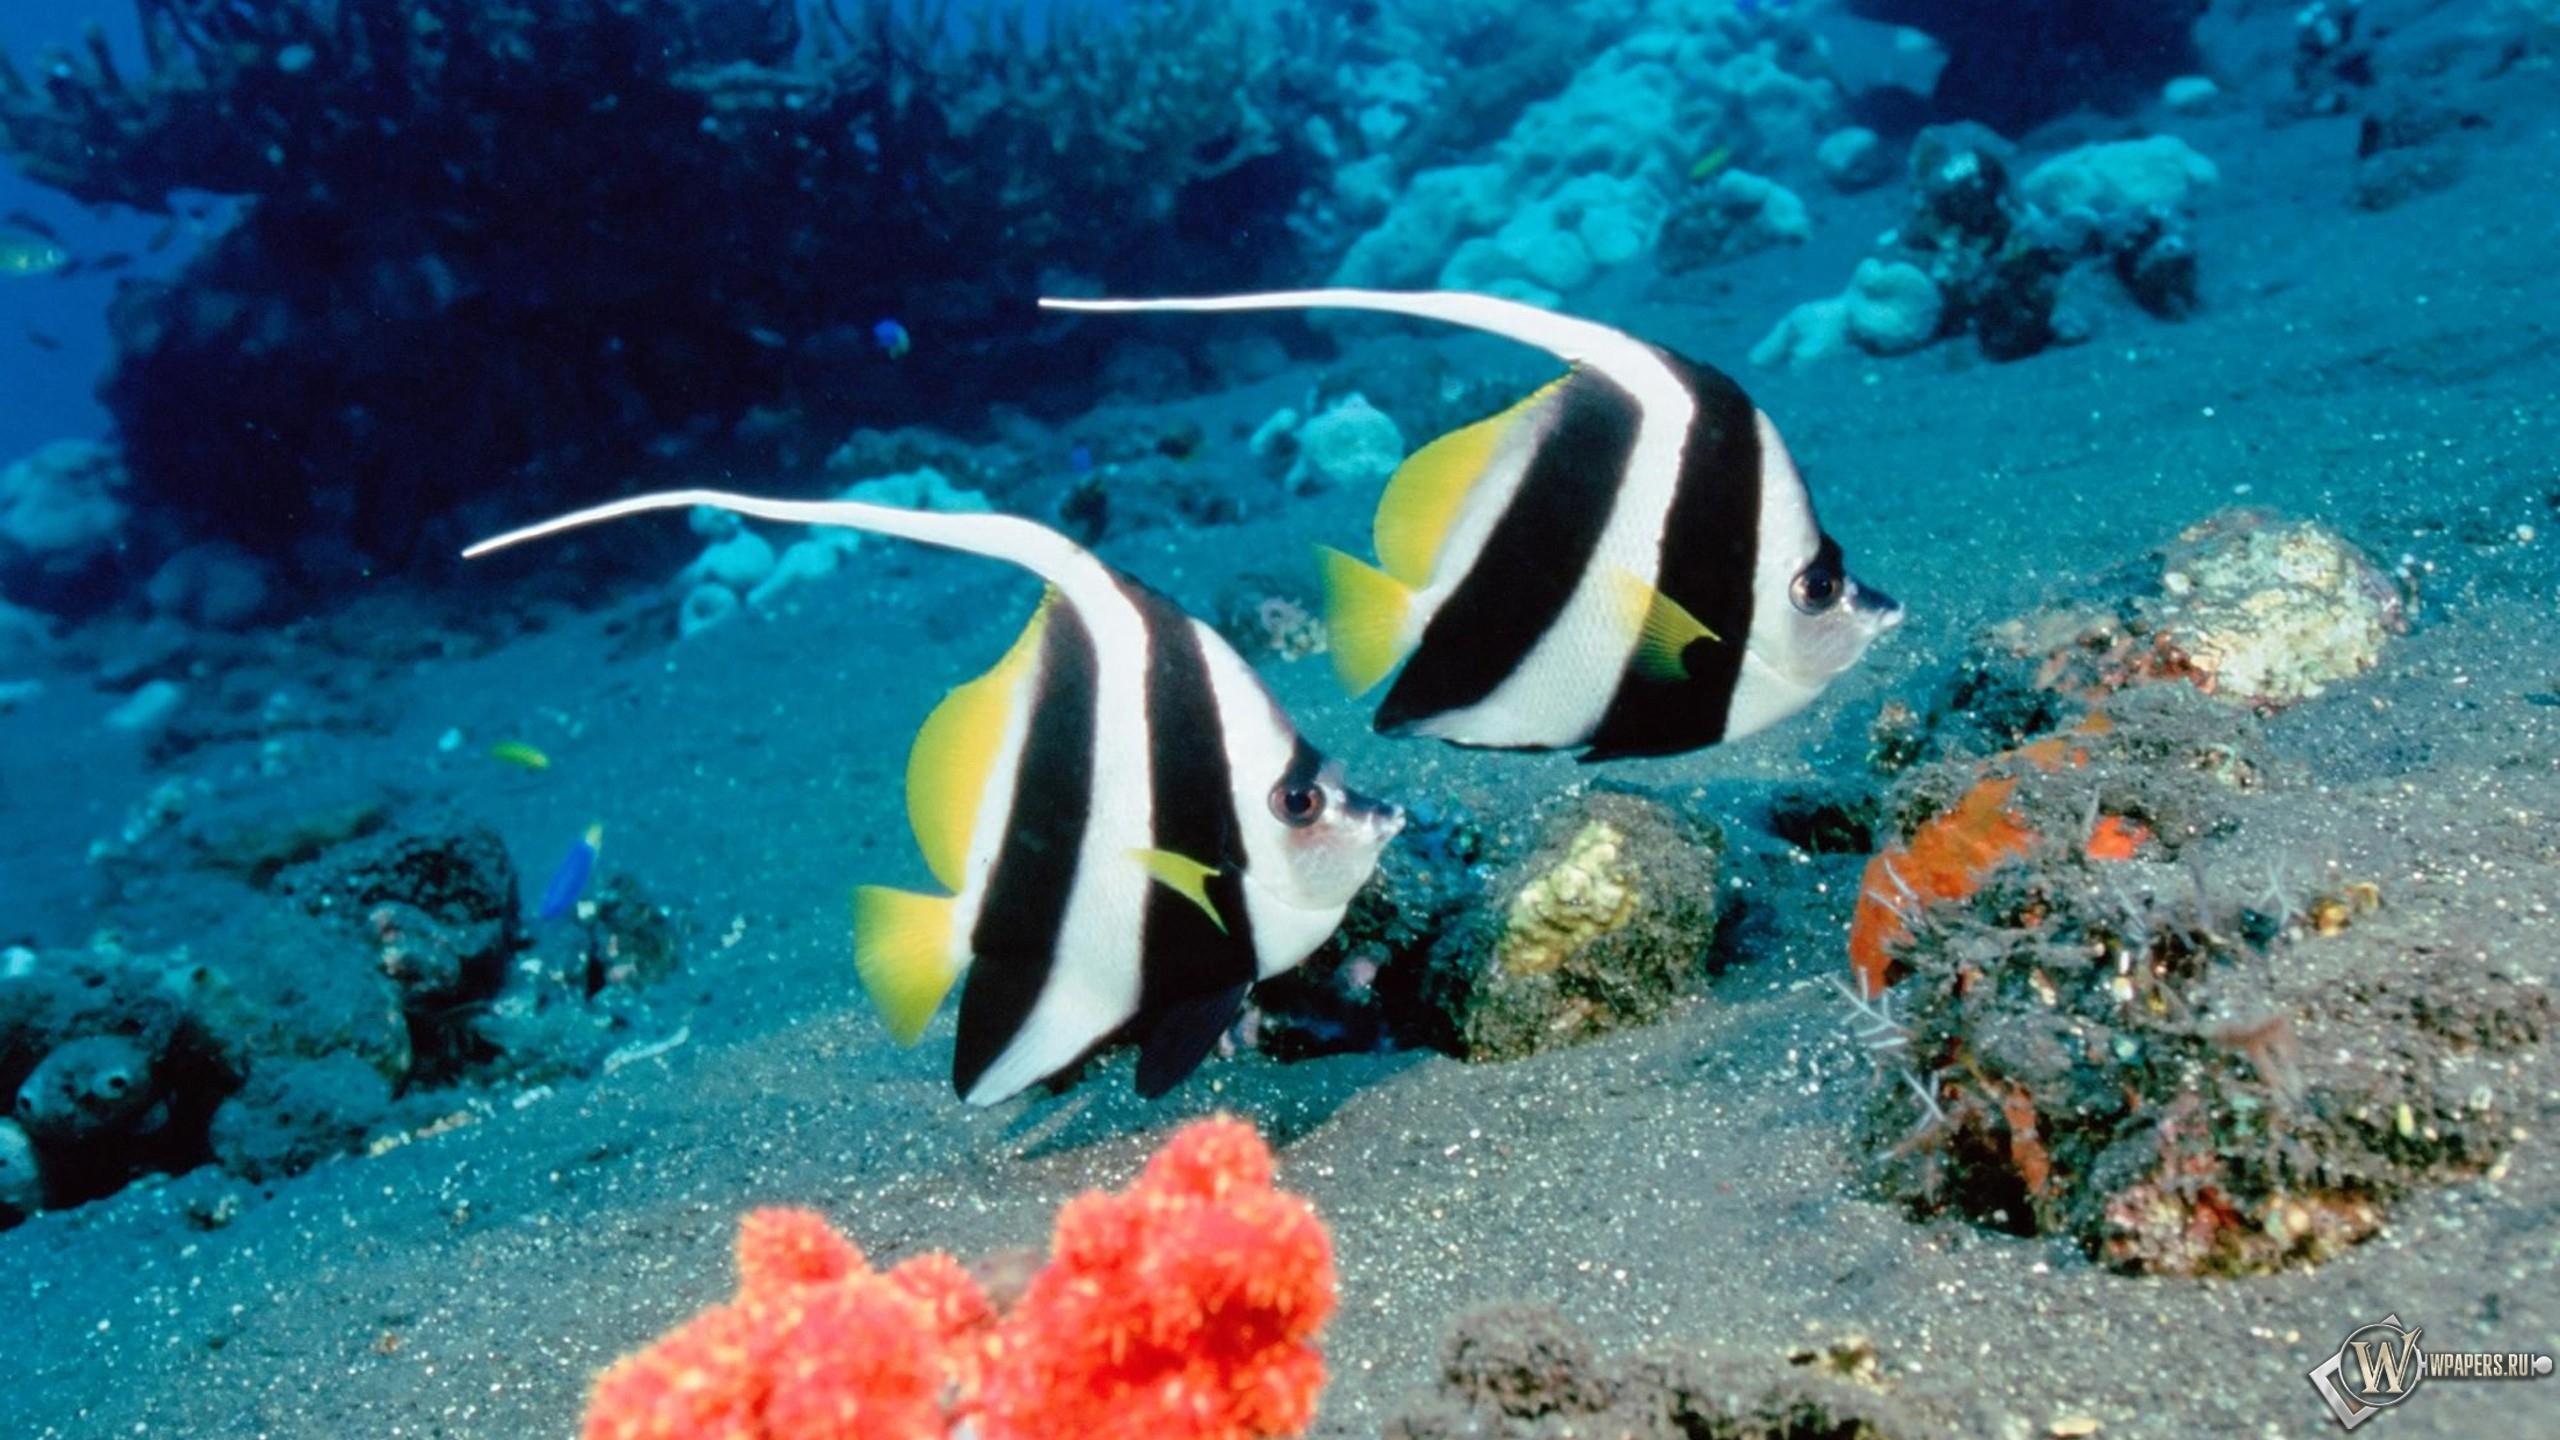 Ocean Life 2560x1440